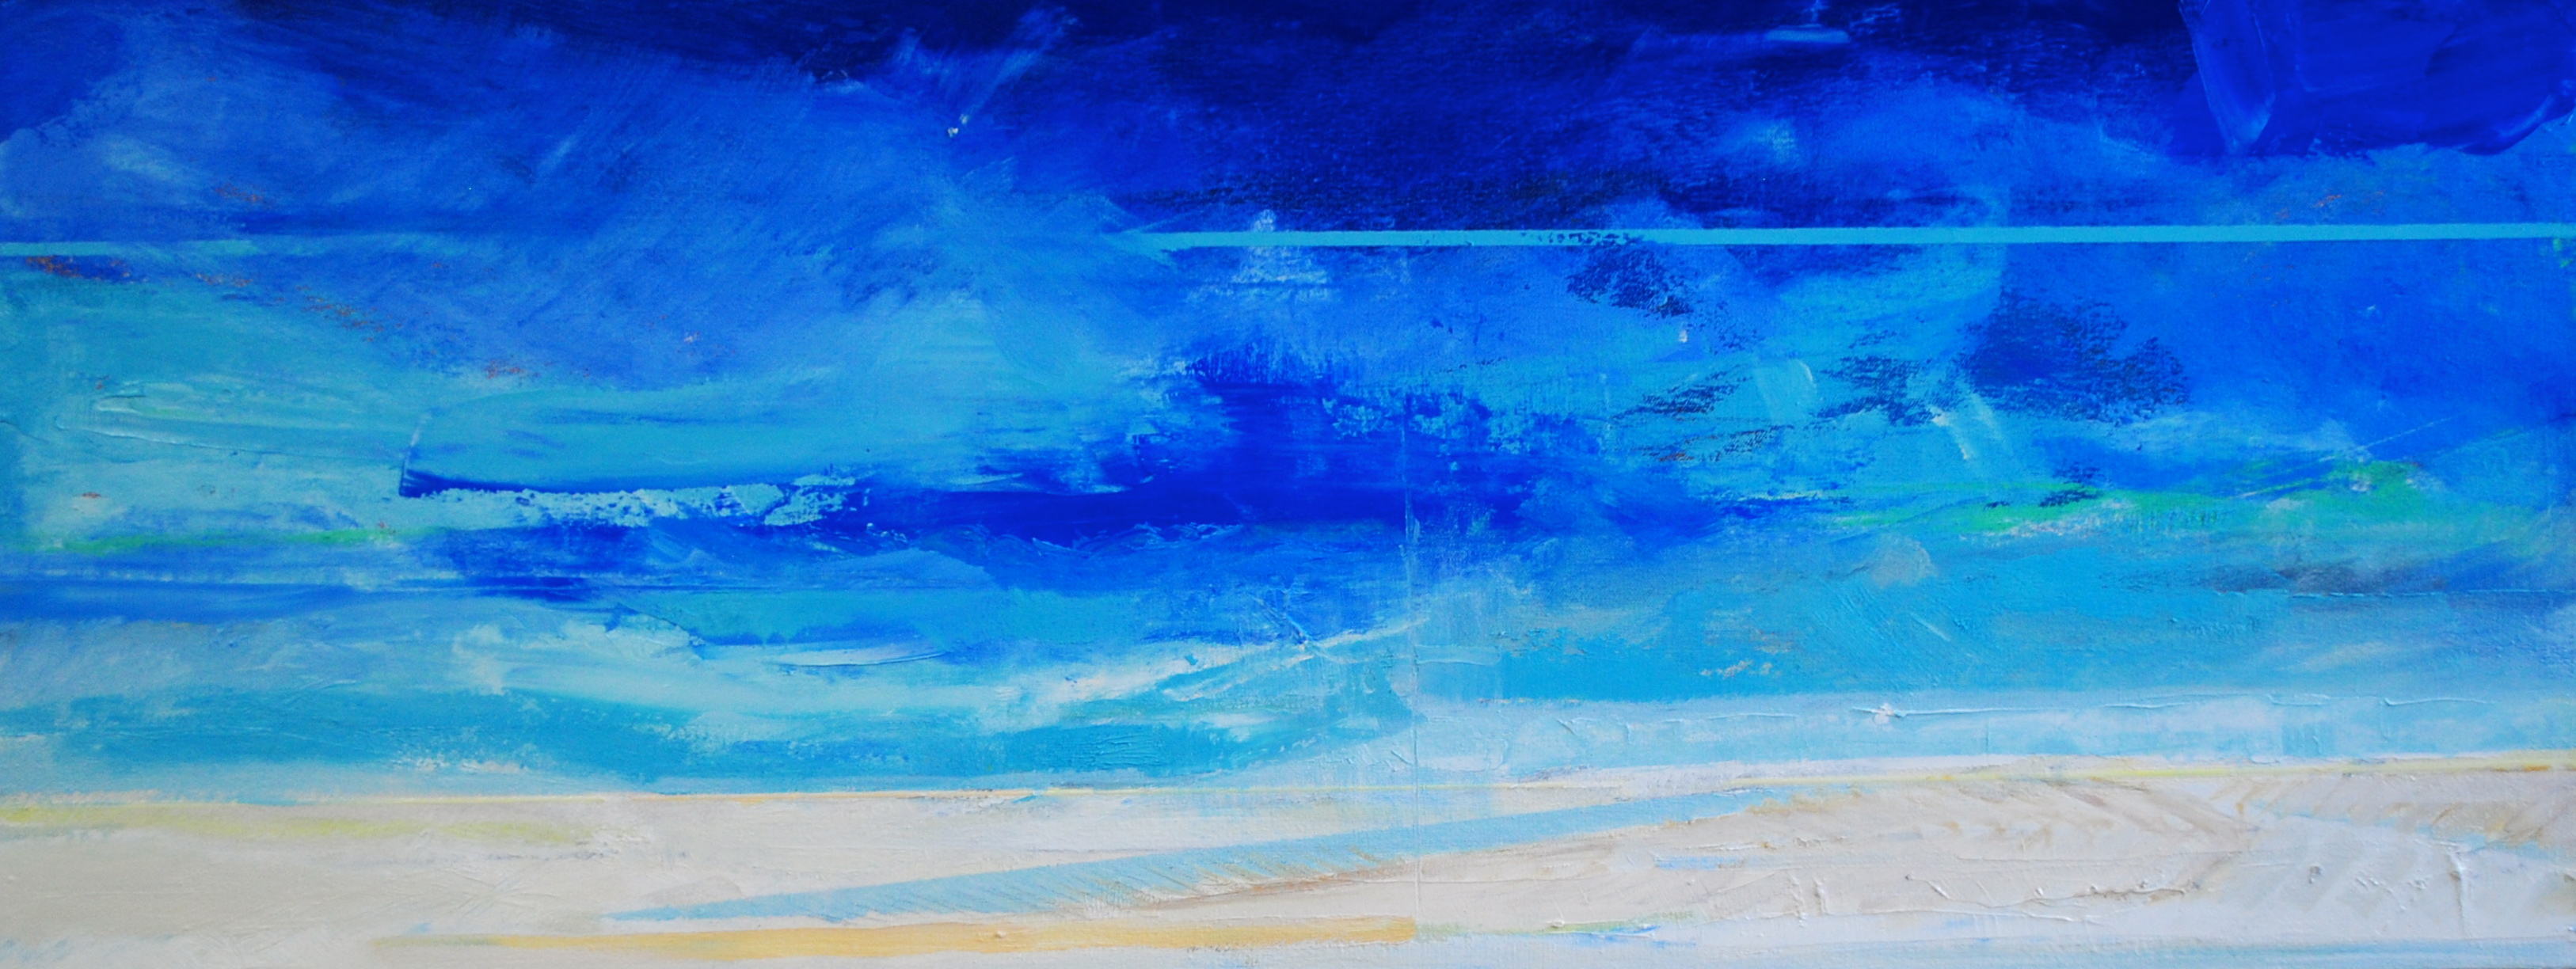 jana-anderson-blue-landscape